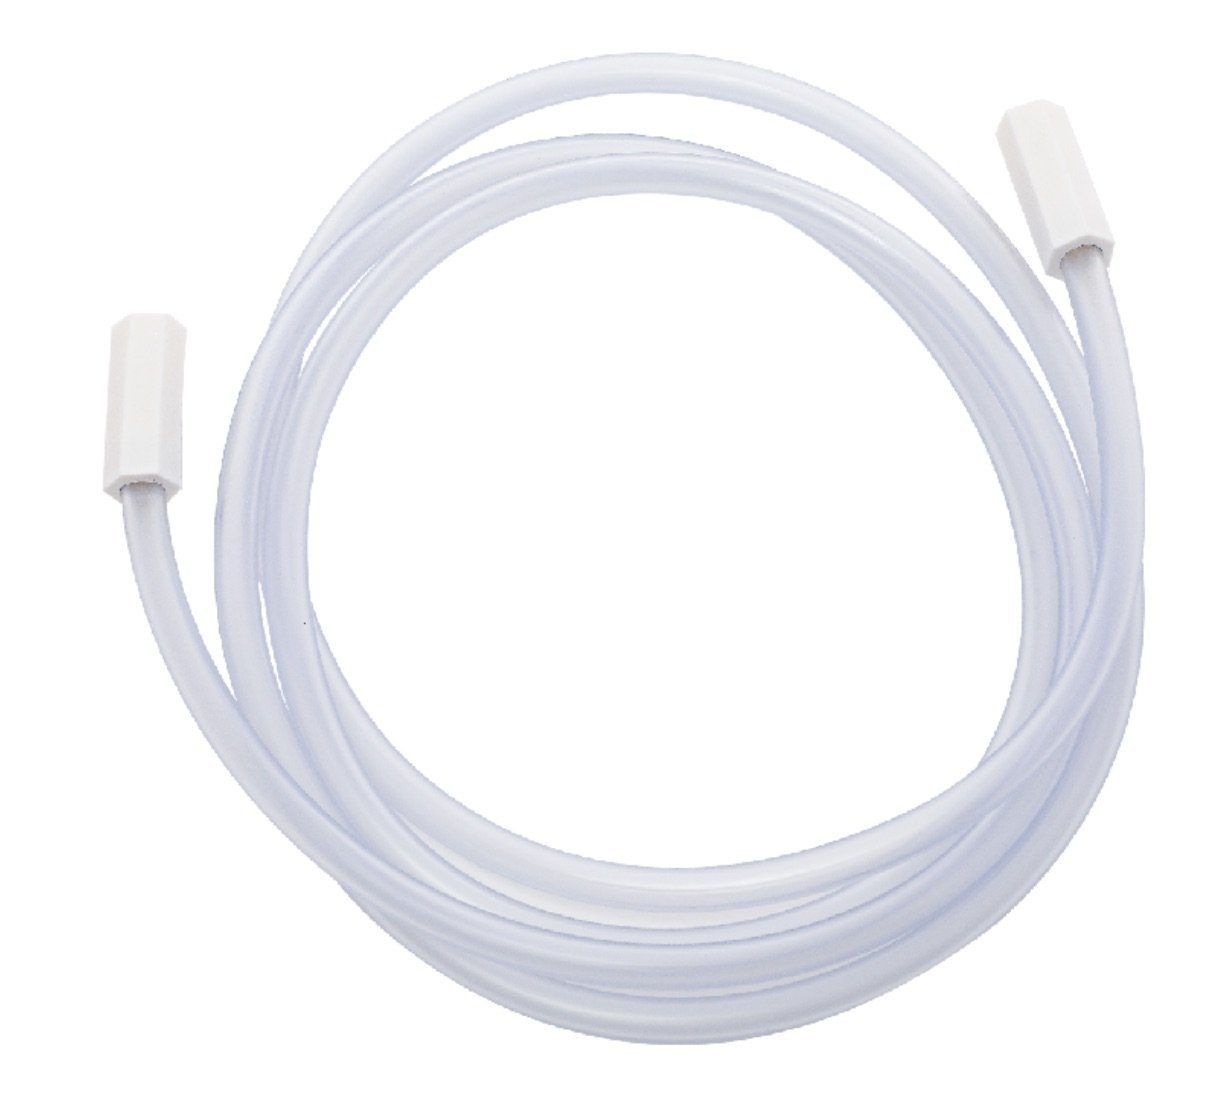 Suction Tubing Flex N/ST 3M